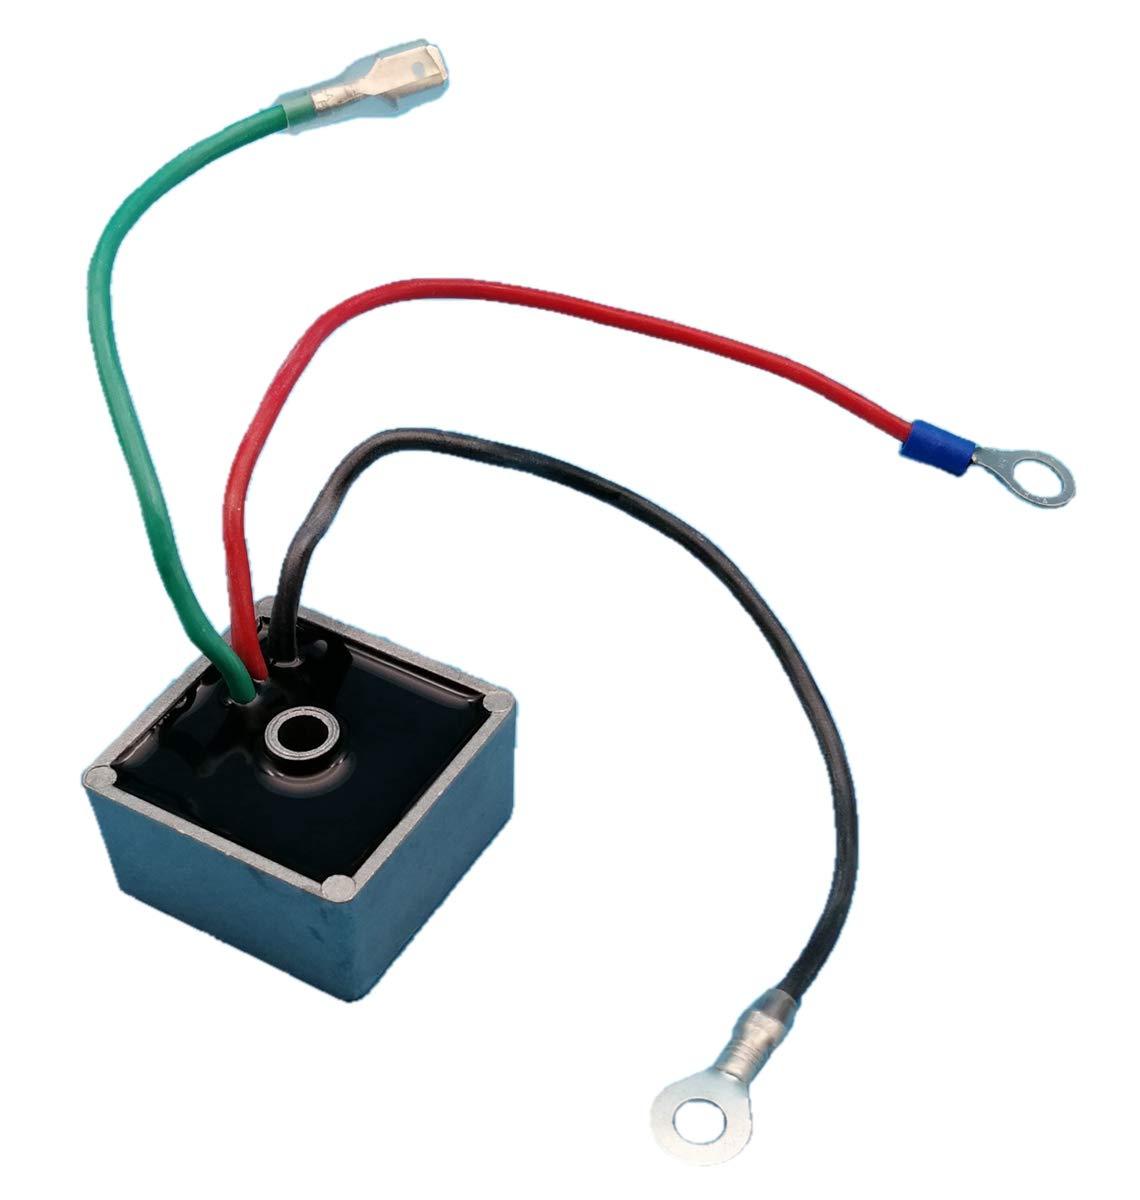 Cart Wiring Diagram Ezgo Golf Cart Wiring Diagram On Find A Wiring